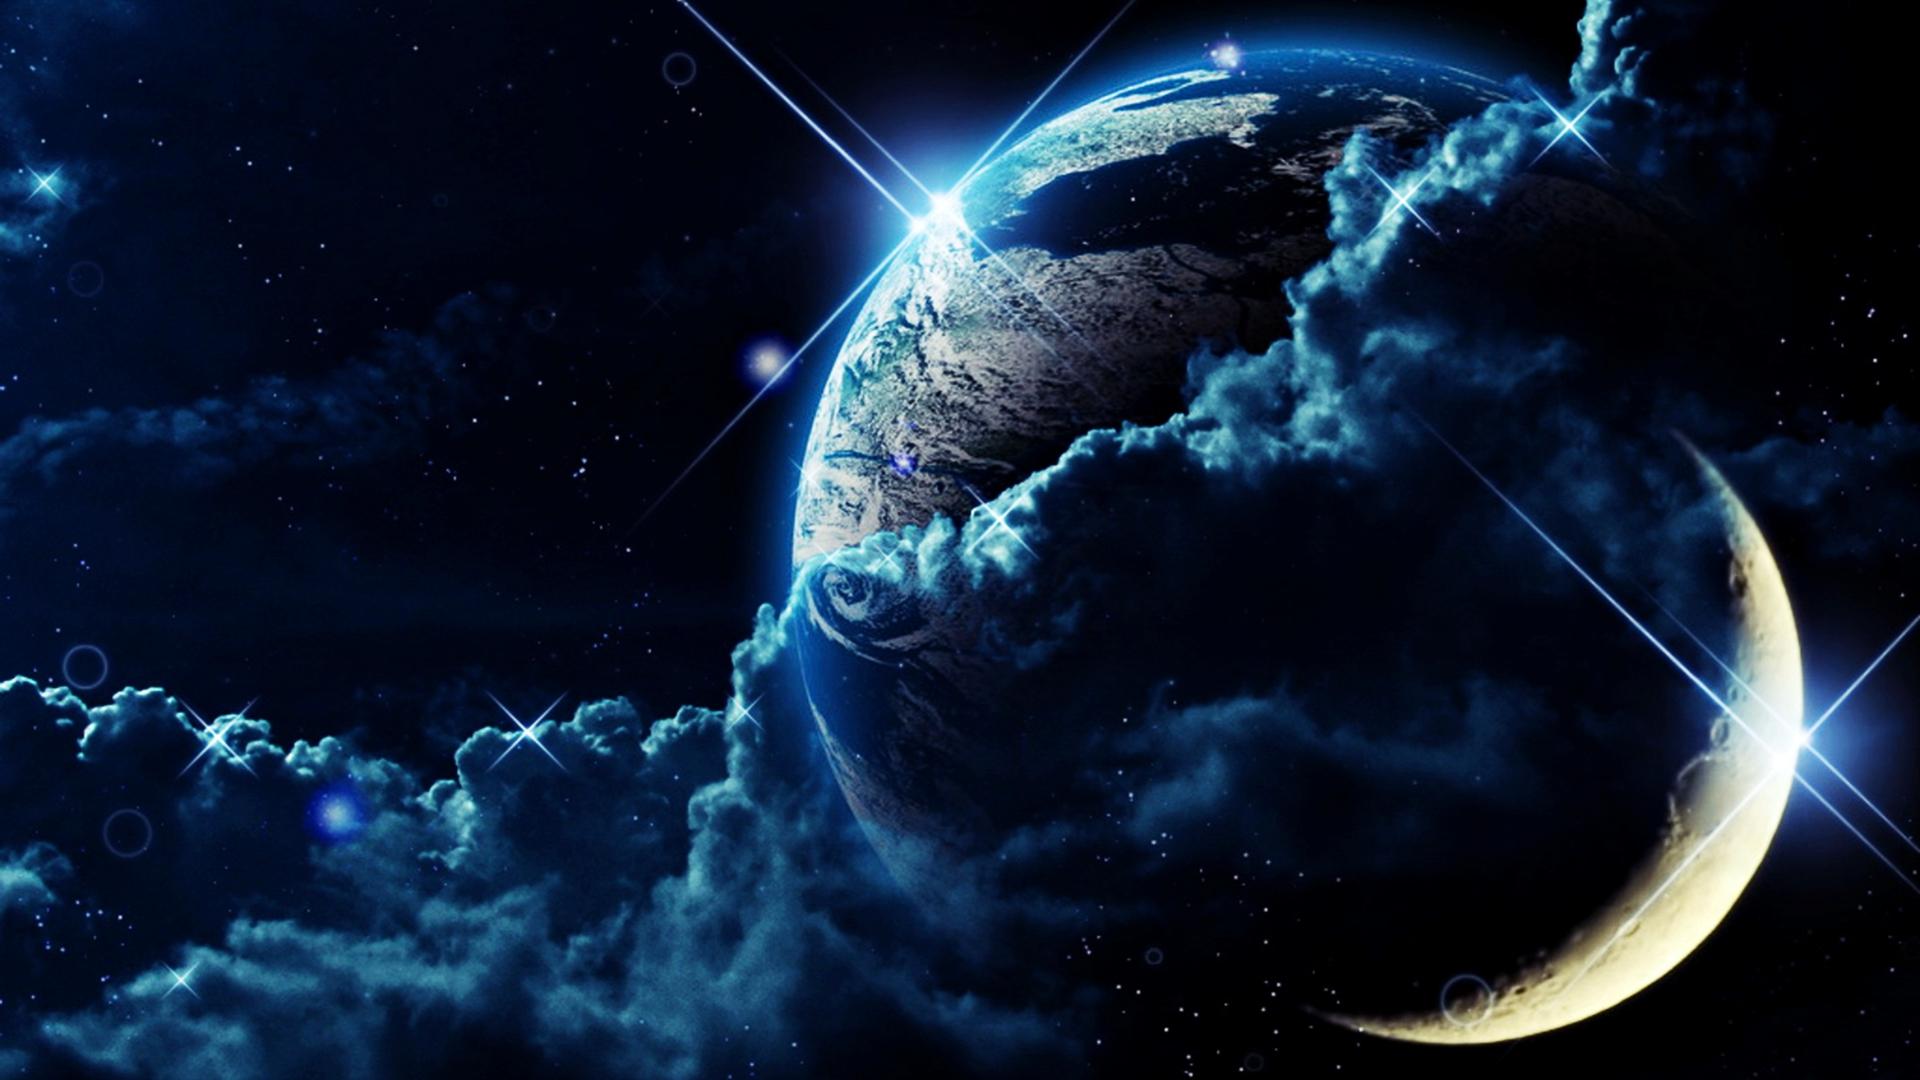 Earth Wallpaper 32 Galaxy Earth Wallpaper 4k 1920x1080 Download Hd Wallpaper Wallpapertip